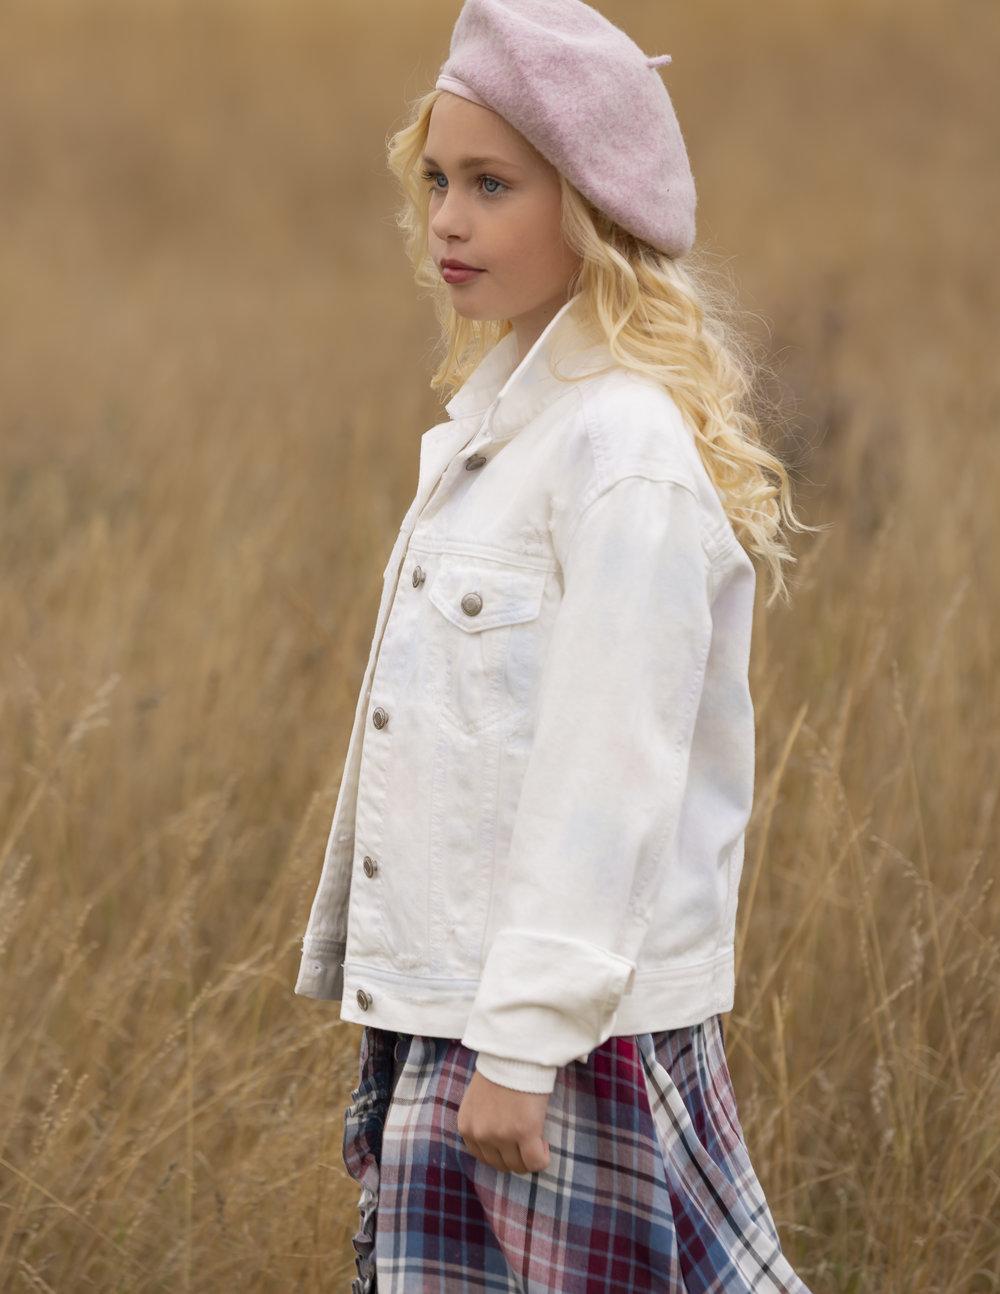 Fashion Editorial Photography - Portland, OR - Michael Verity Photography - Madison Fashion magazine - Free Spirit 3